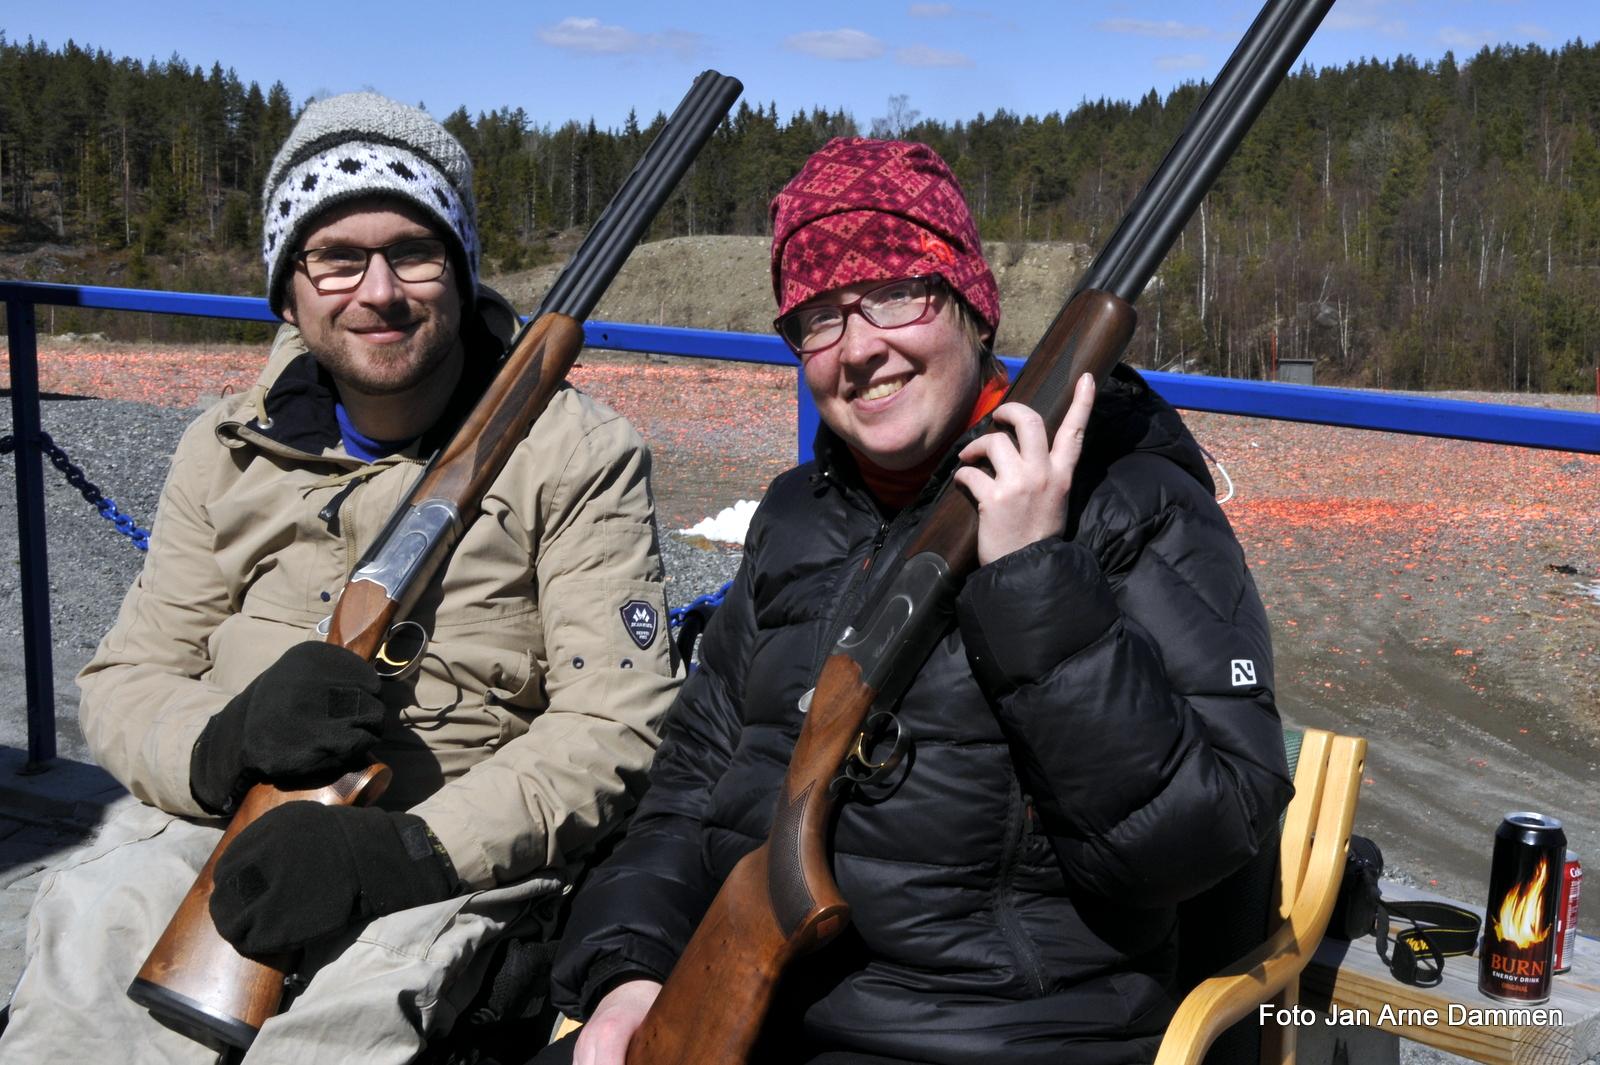 Atle Kristian Kolbeinsen og Magni Sørgaard fra NHF Halden Aremark. Foto Jan Arne Dammen